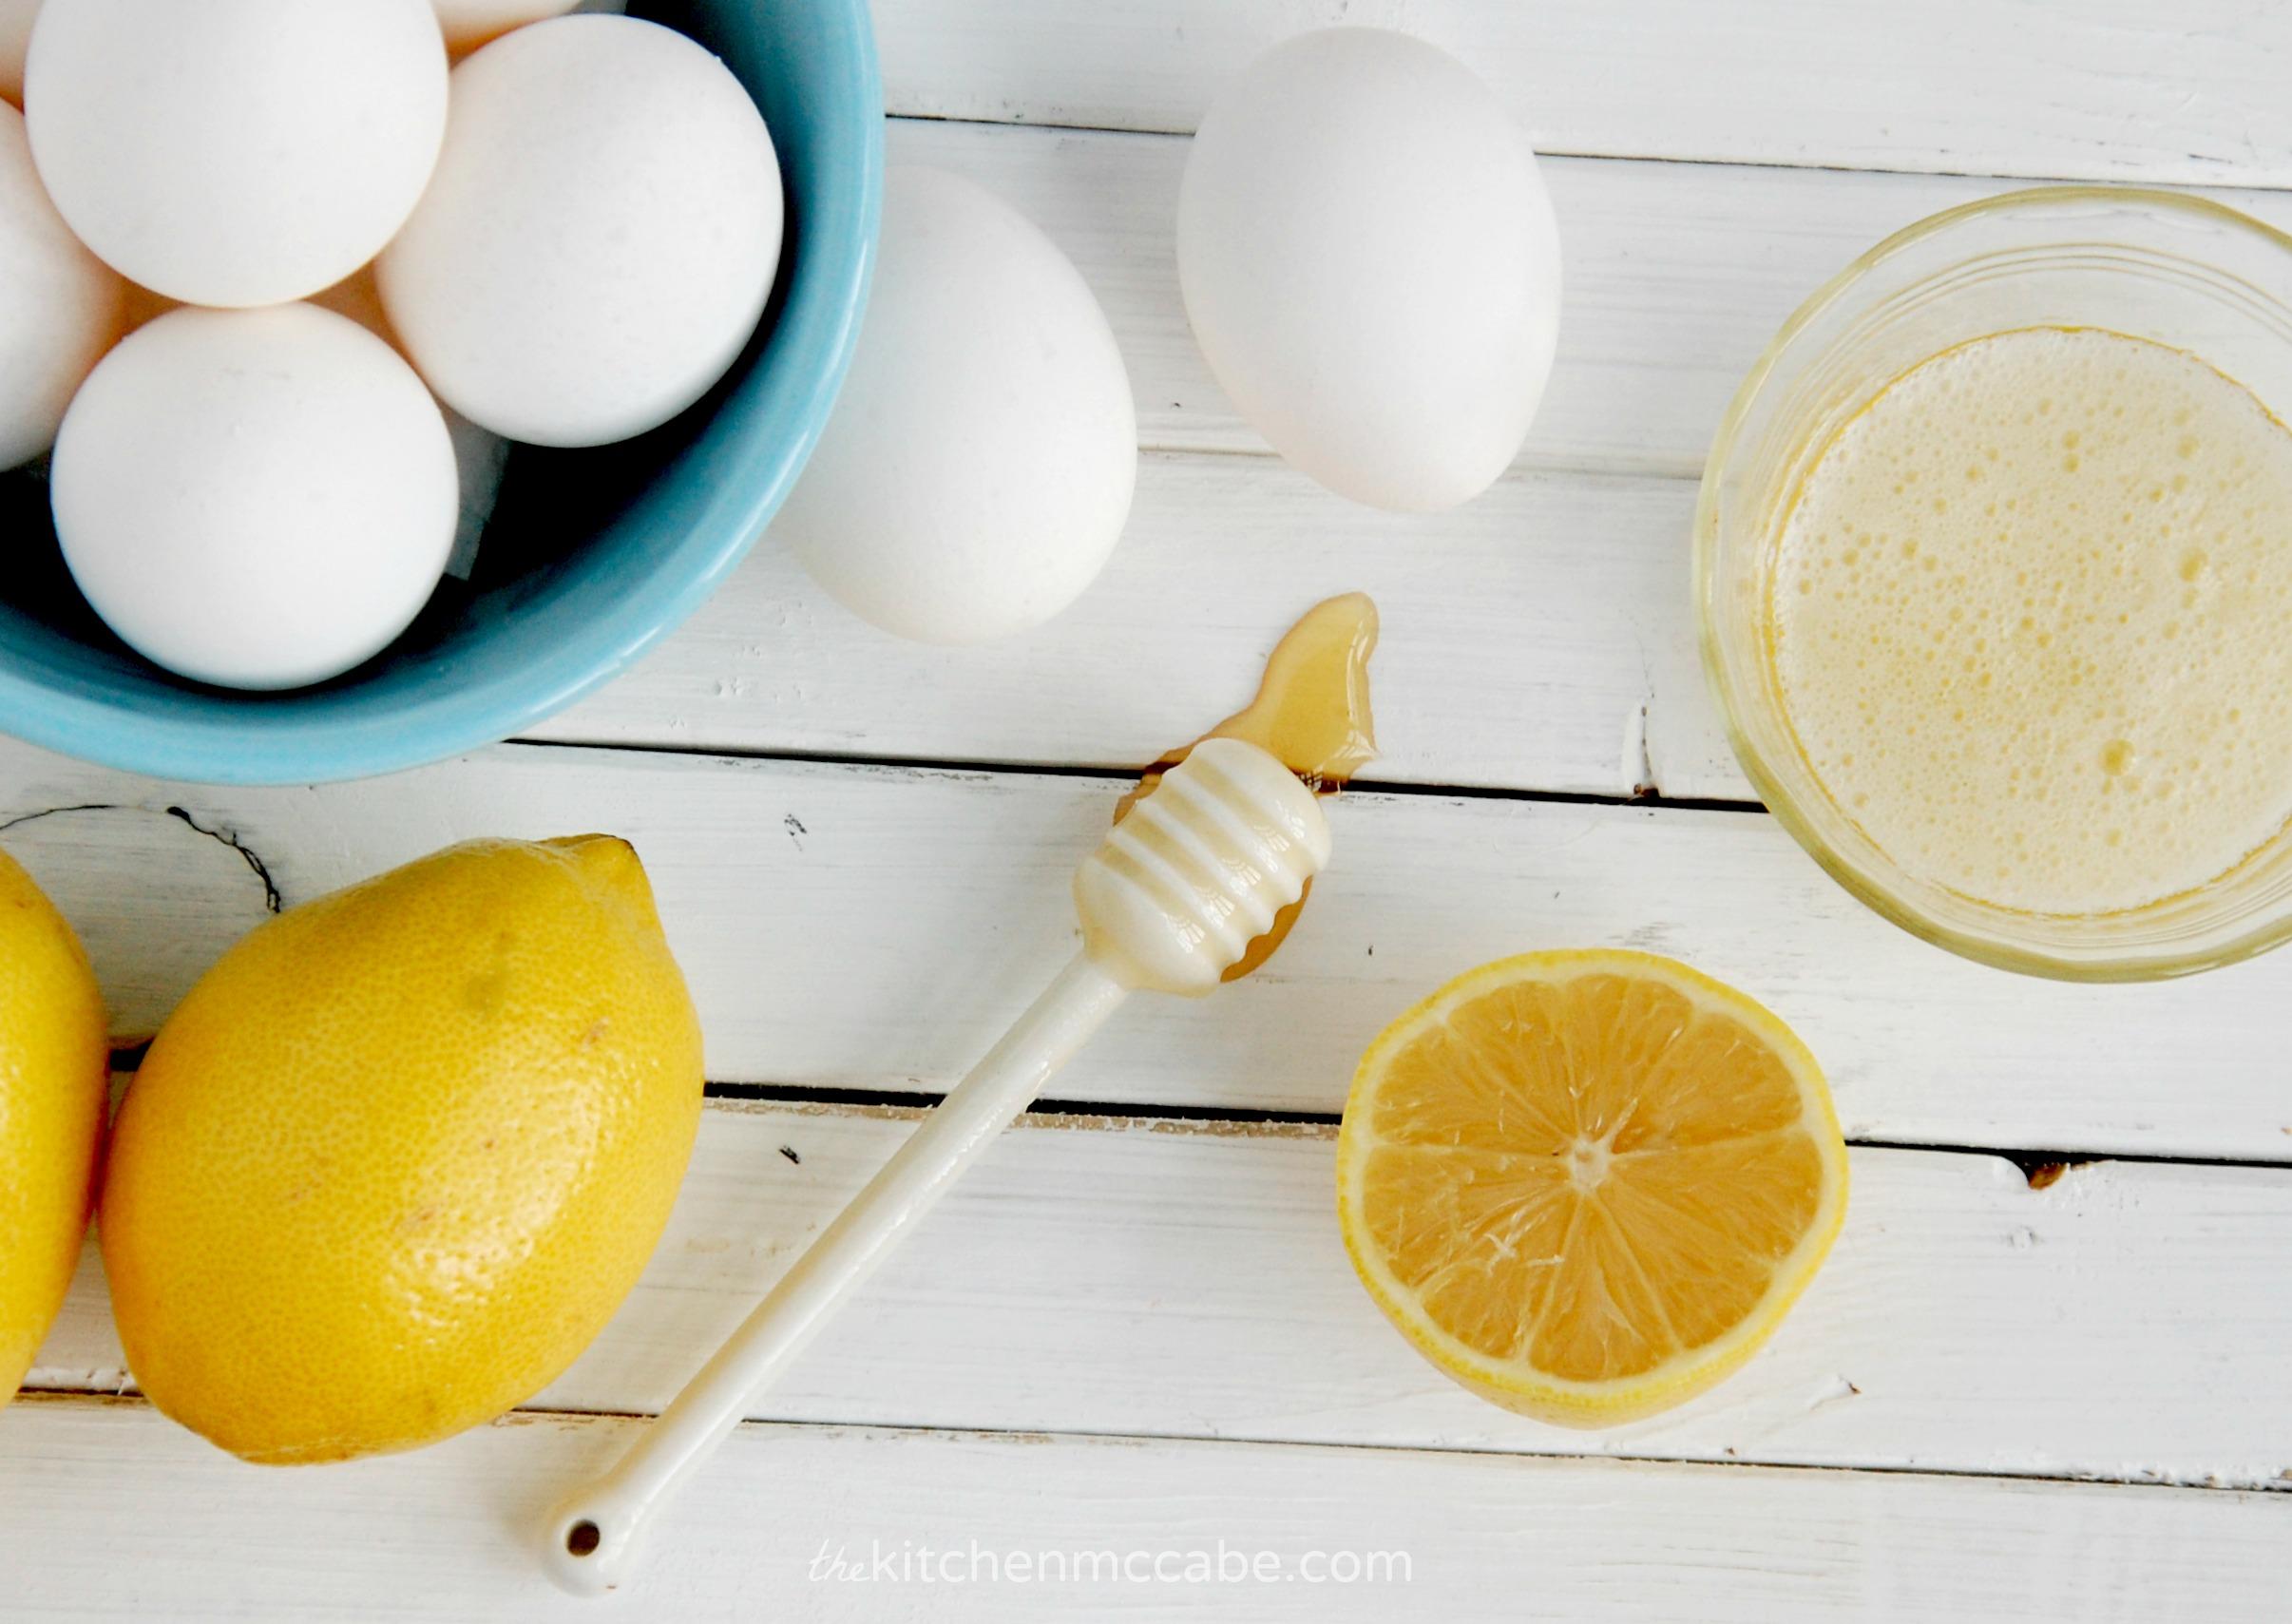 Hasil gambar untuk Masker Putih Telur Untuk Kecantikan